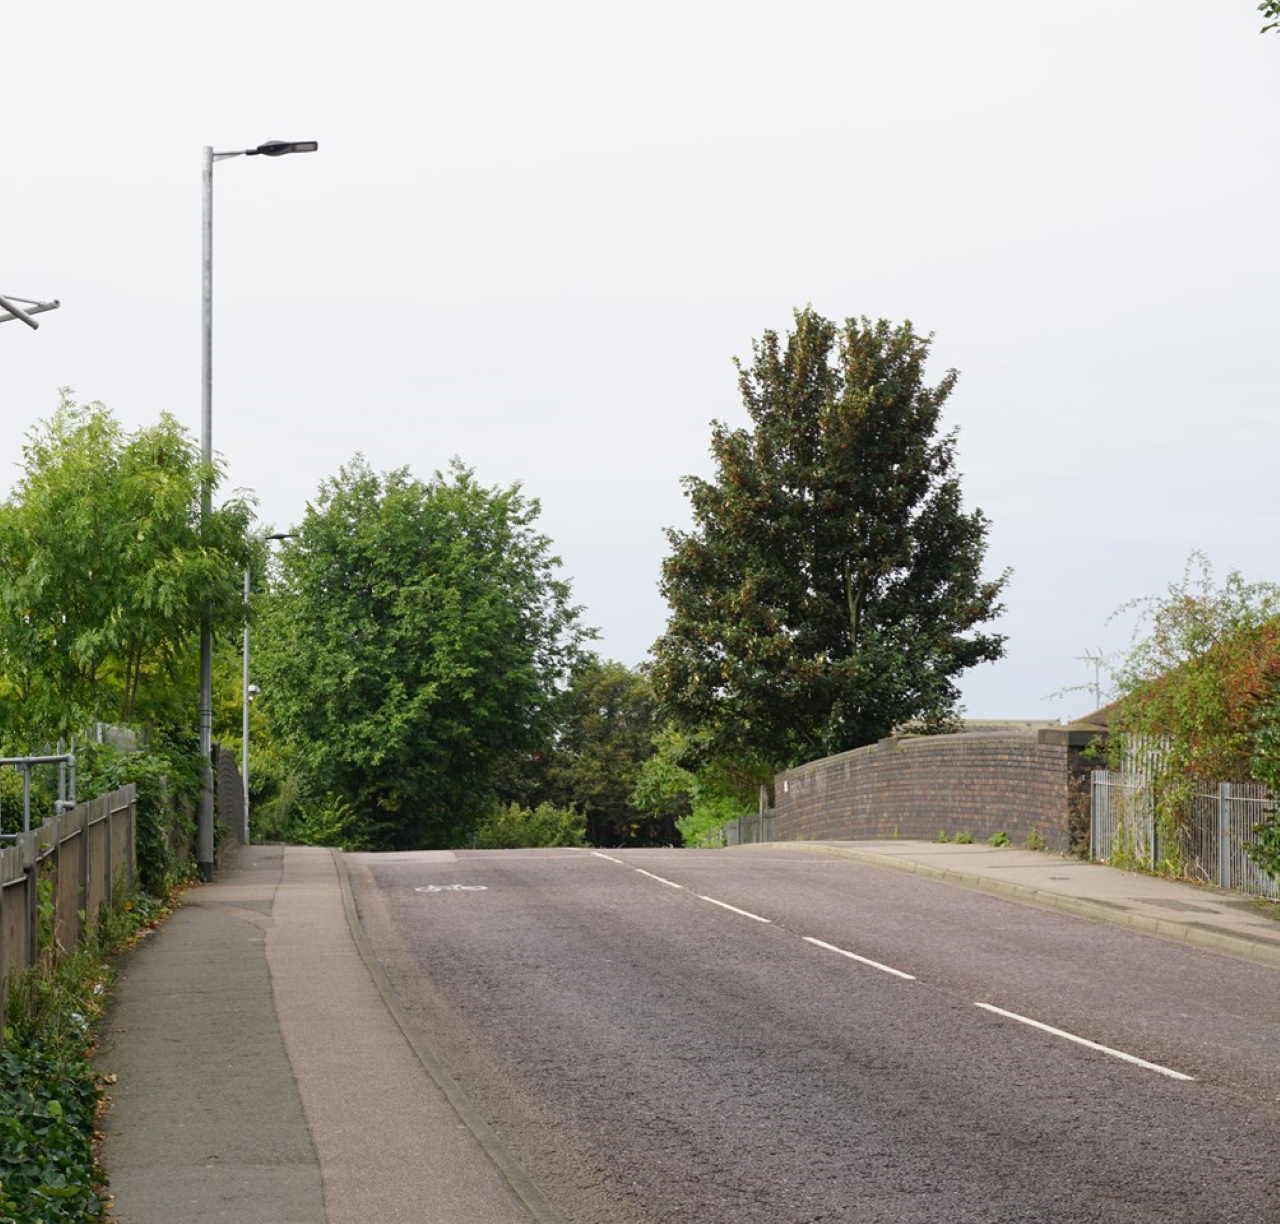 Bromham Road